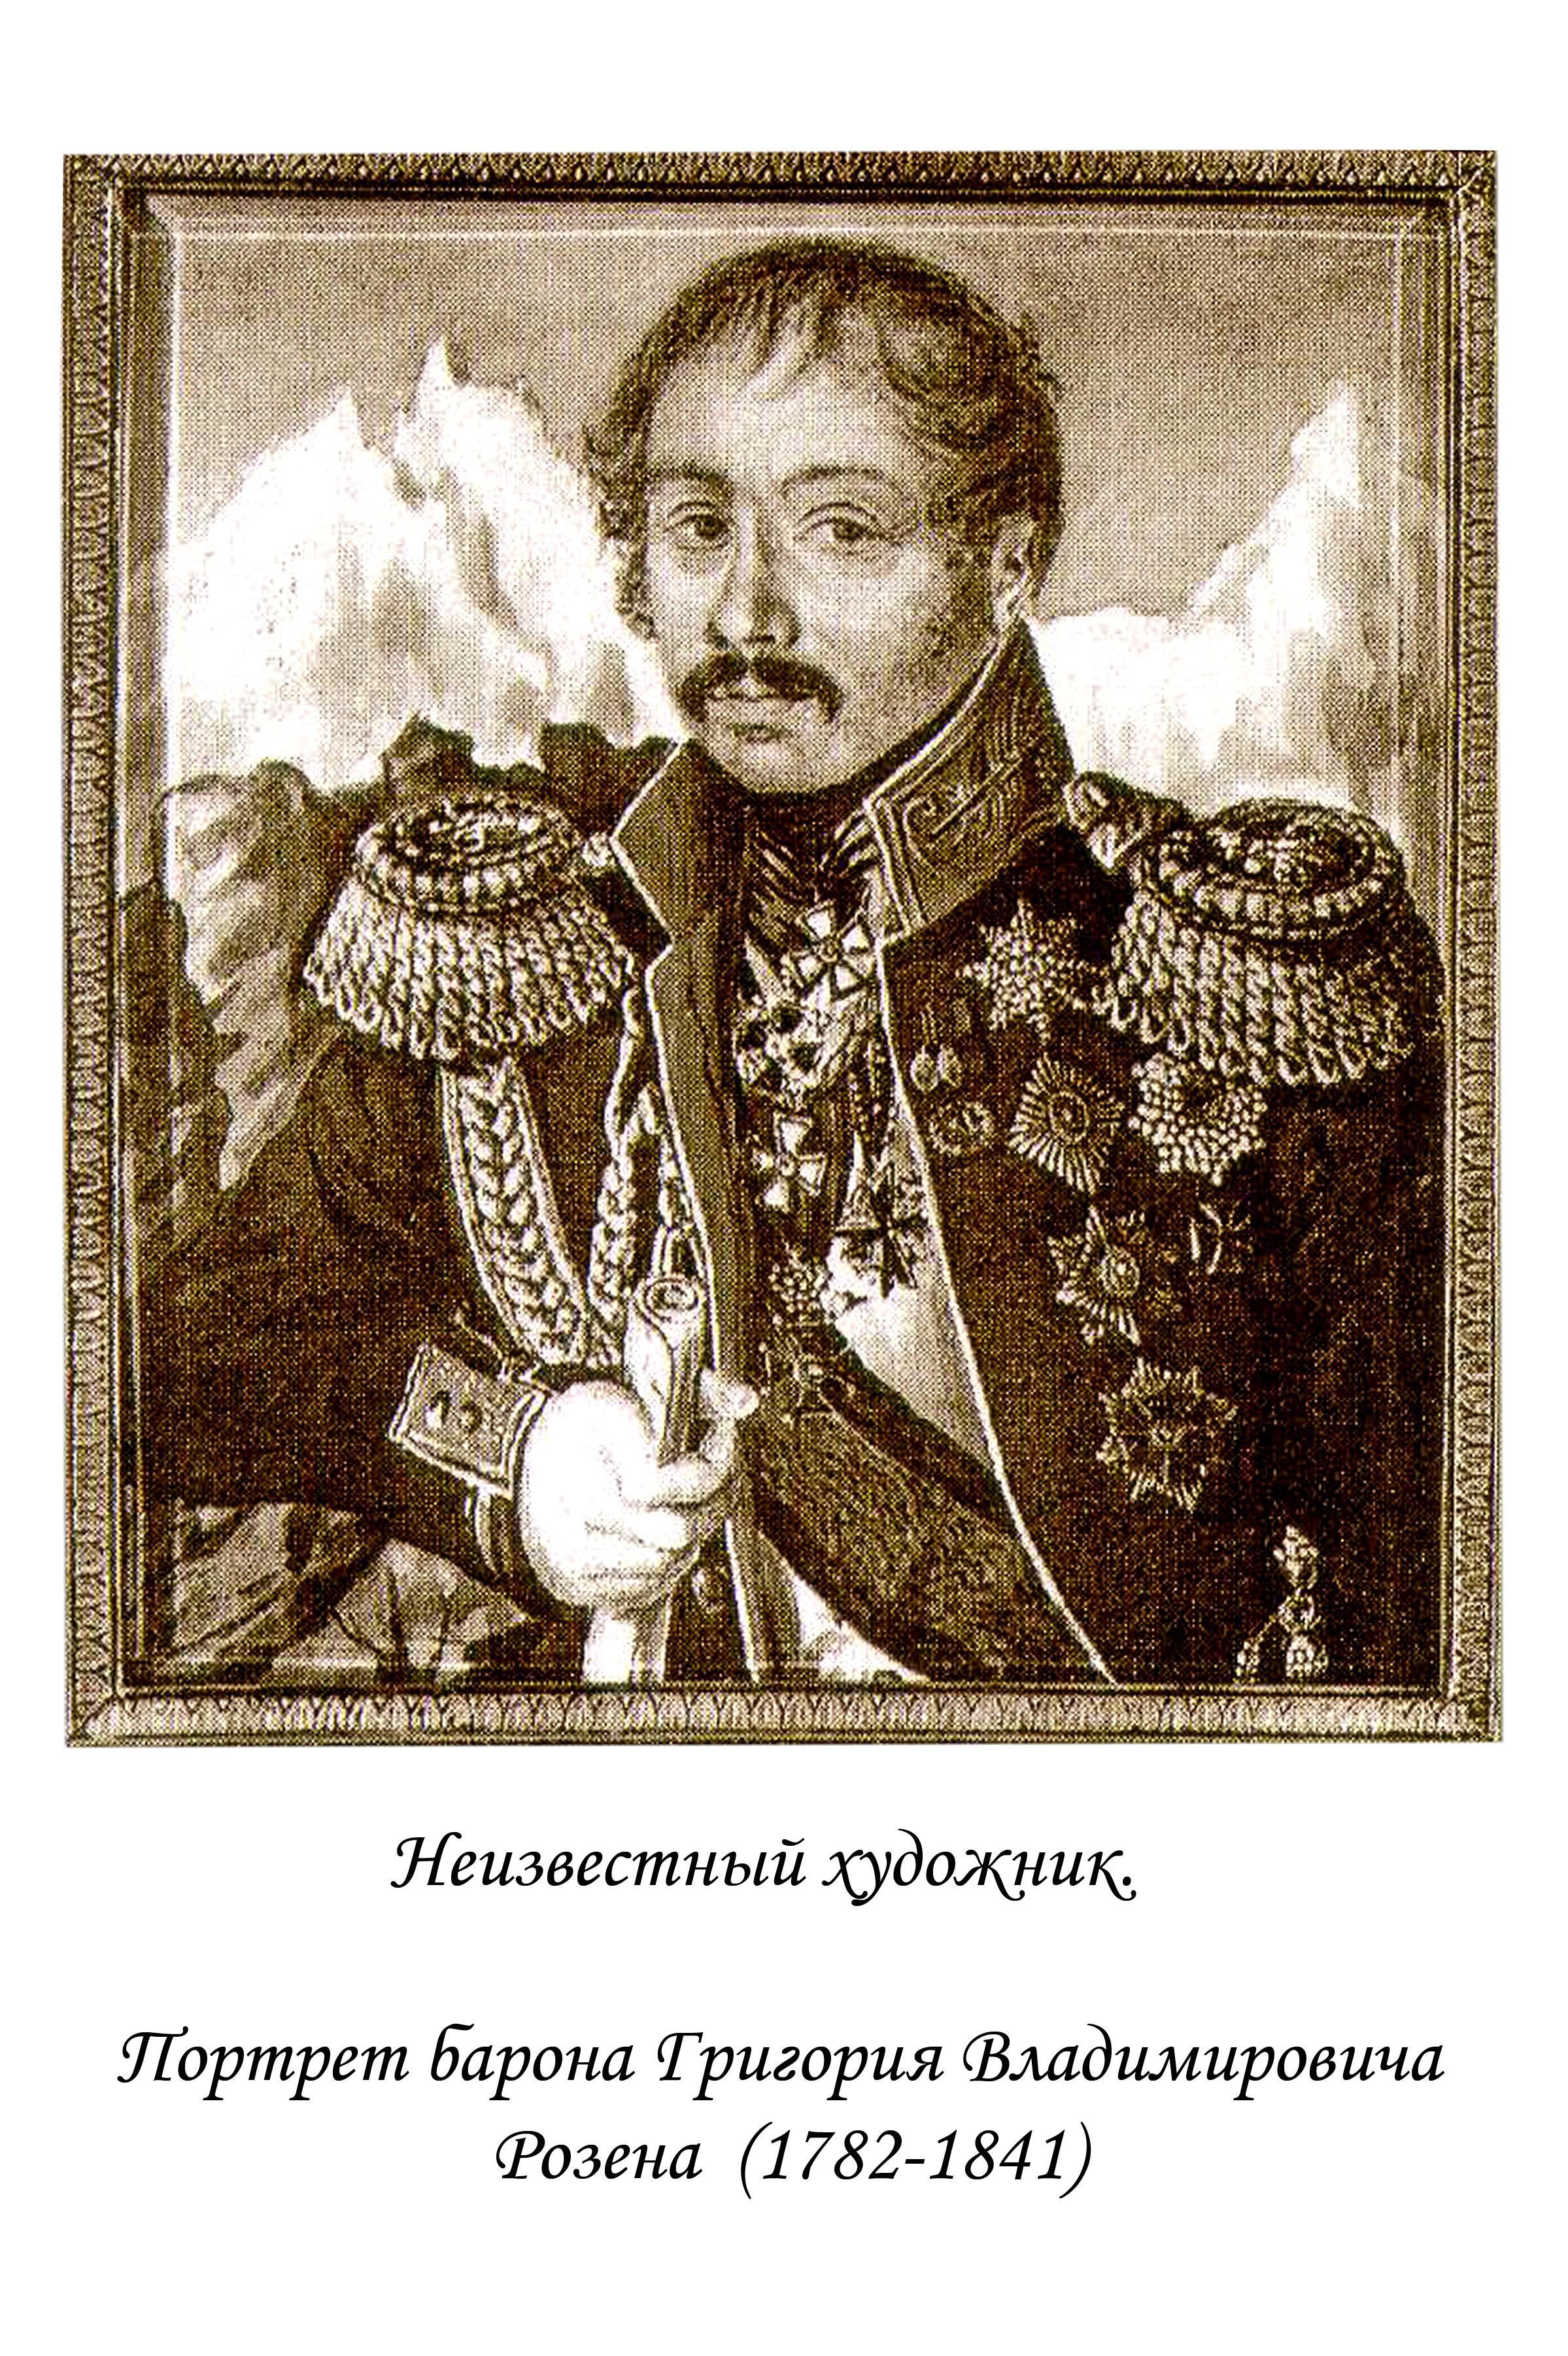 http://molitva-ivanovo.narod.ru/pages/pages69big.jpg